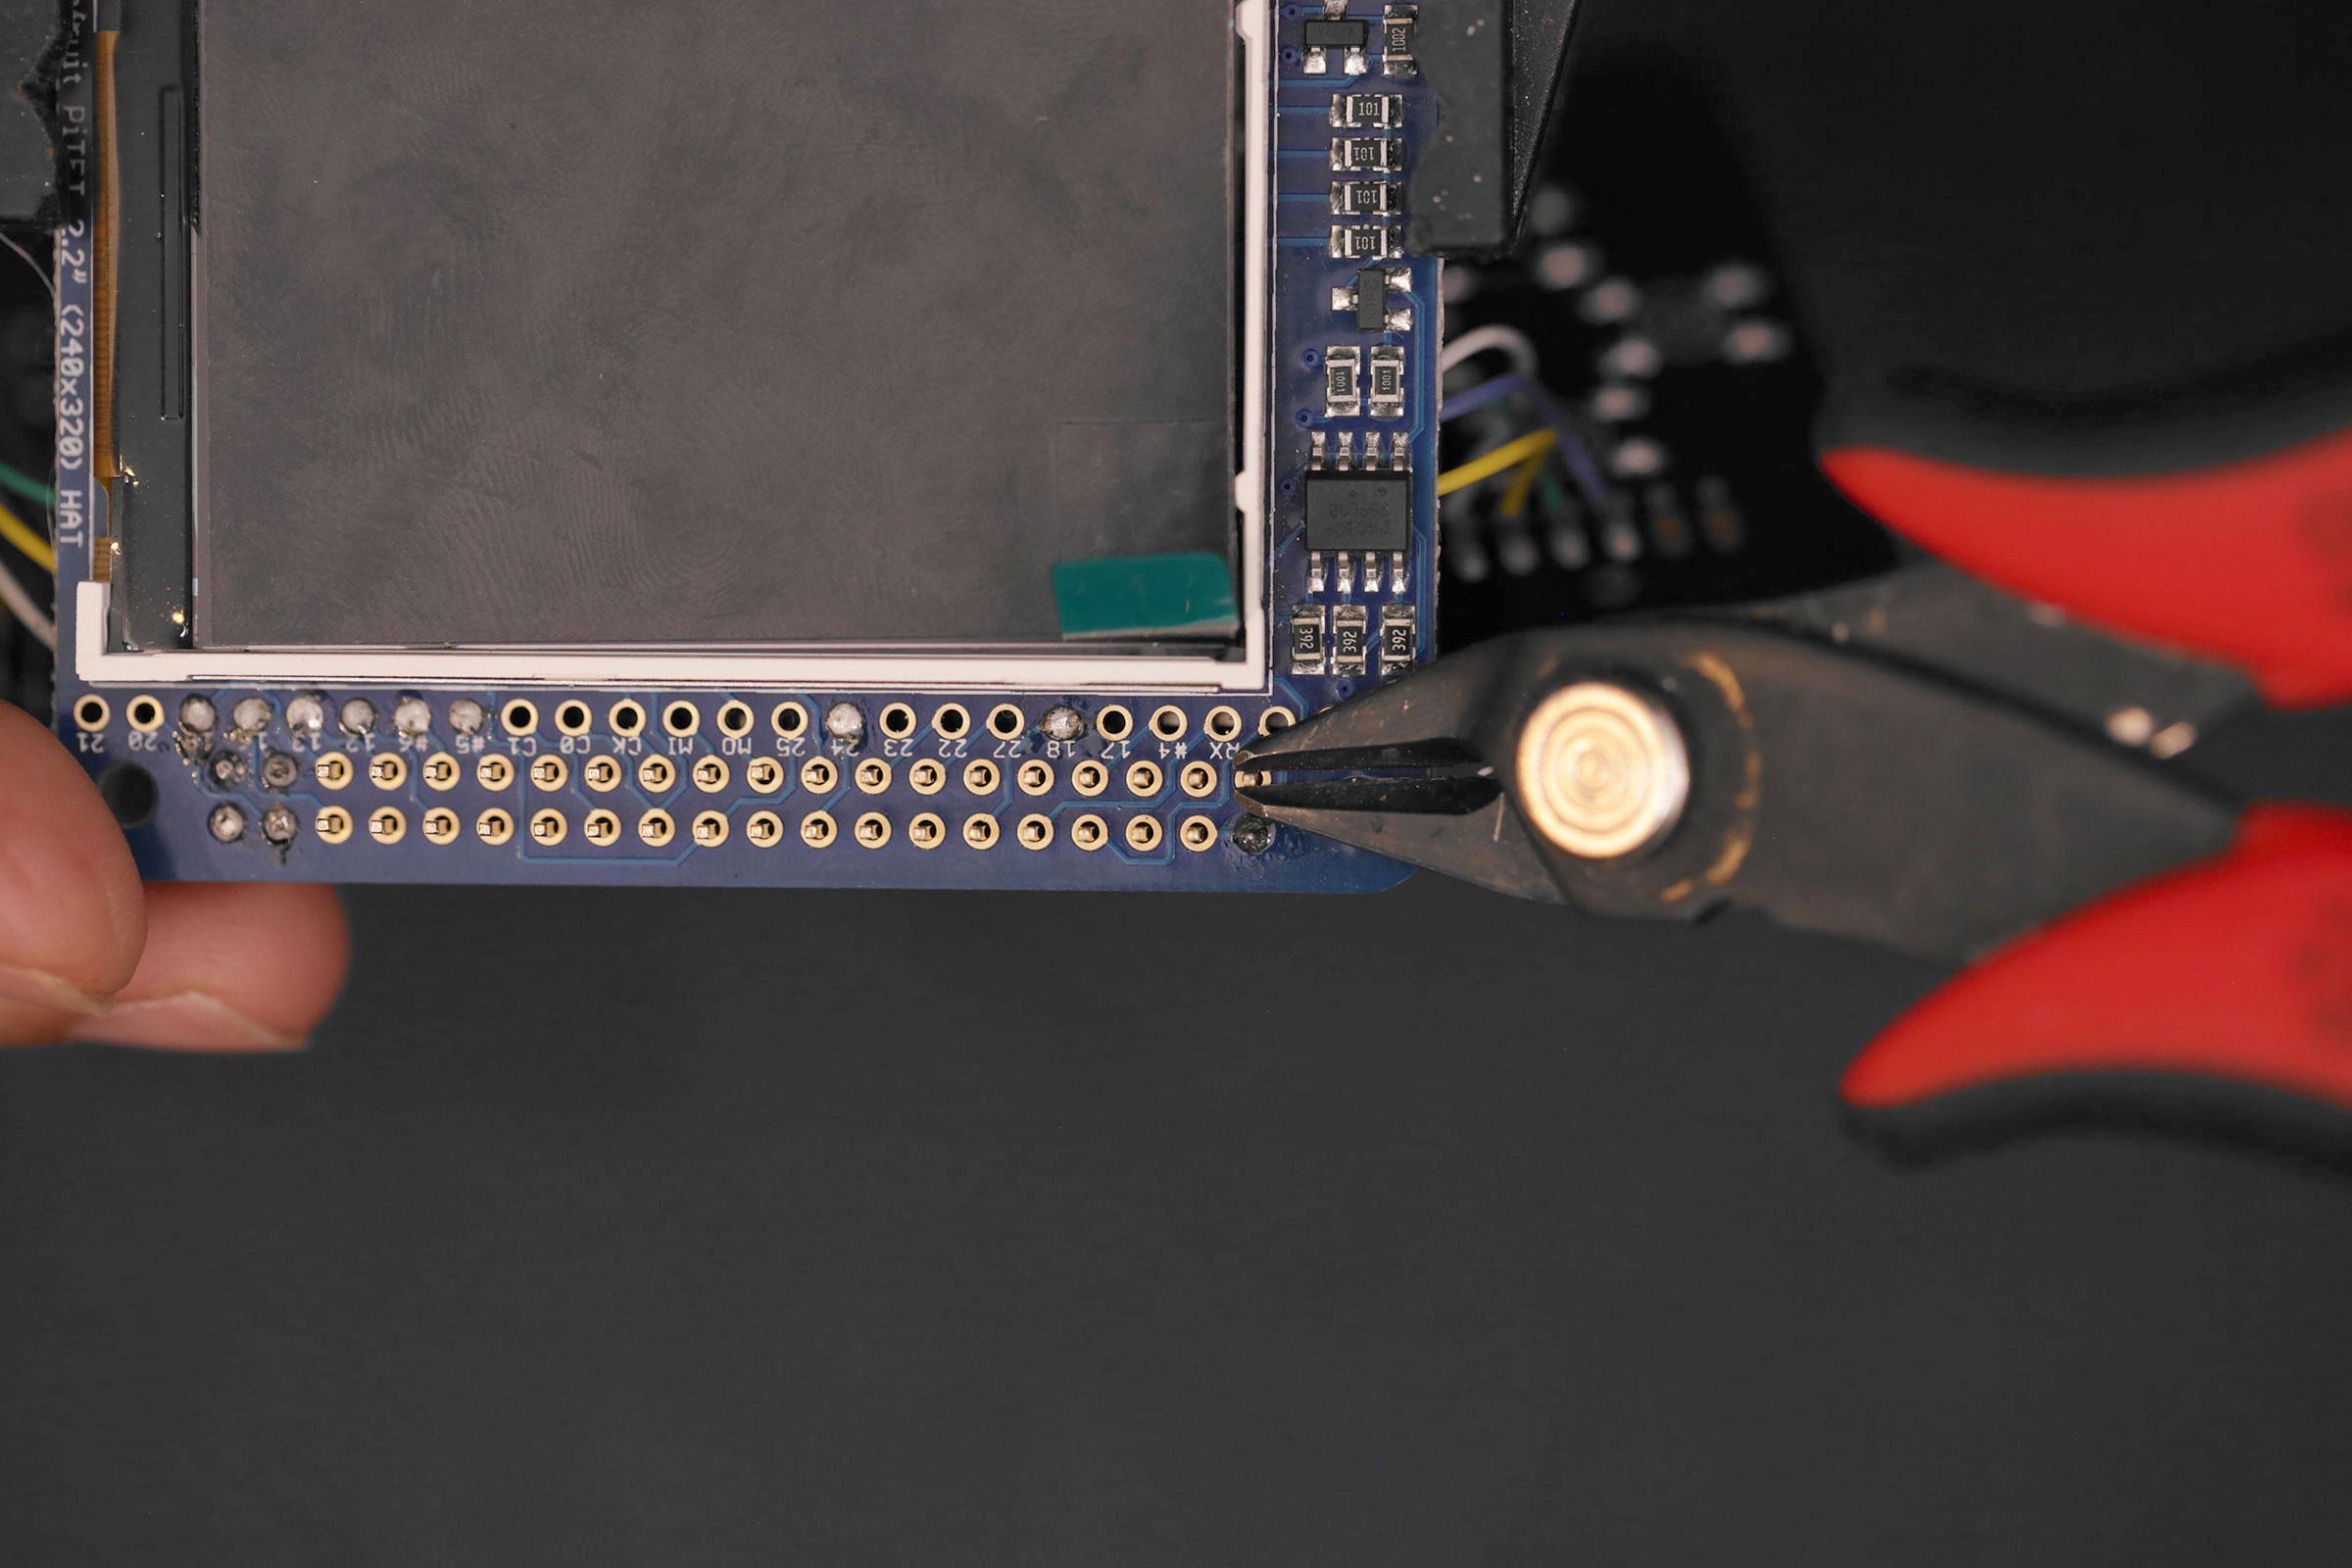 raspberry_pi_pizero-pitft-trim-pins.jpg